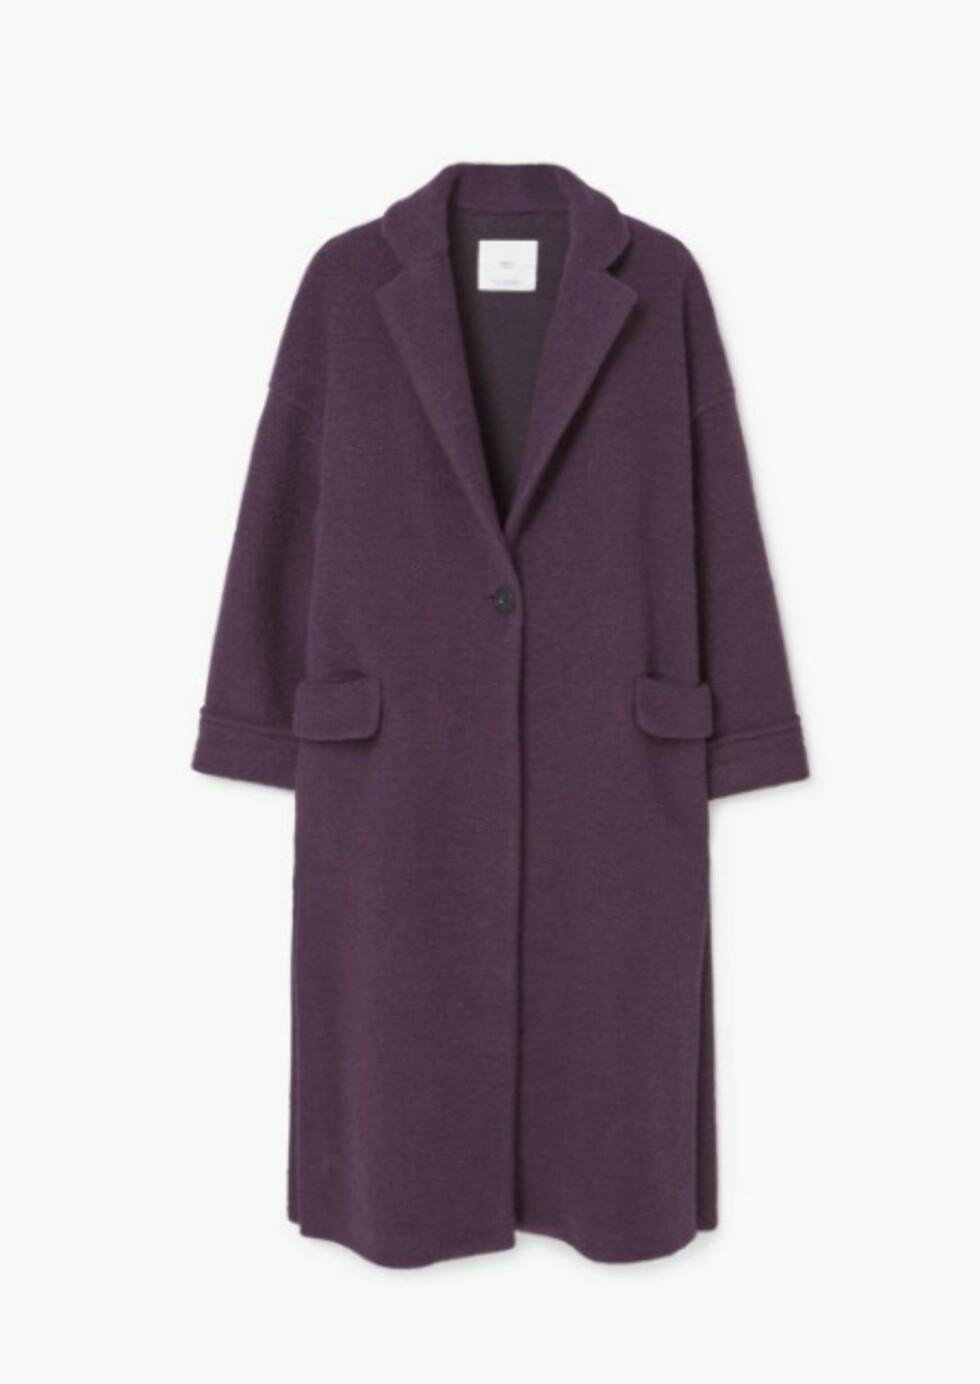 Kåpe fra Mango   kr 599   http://shop.mango.com/NO-en/p1/woman/clothing/coats/coats/textured-wool-blend-coat?id=81030230_65&n=1&s=mss_she&ts=1489999763383